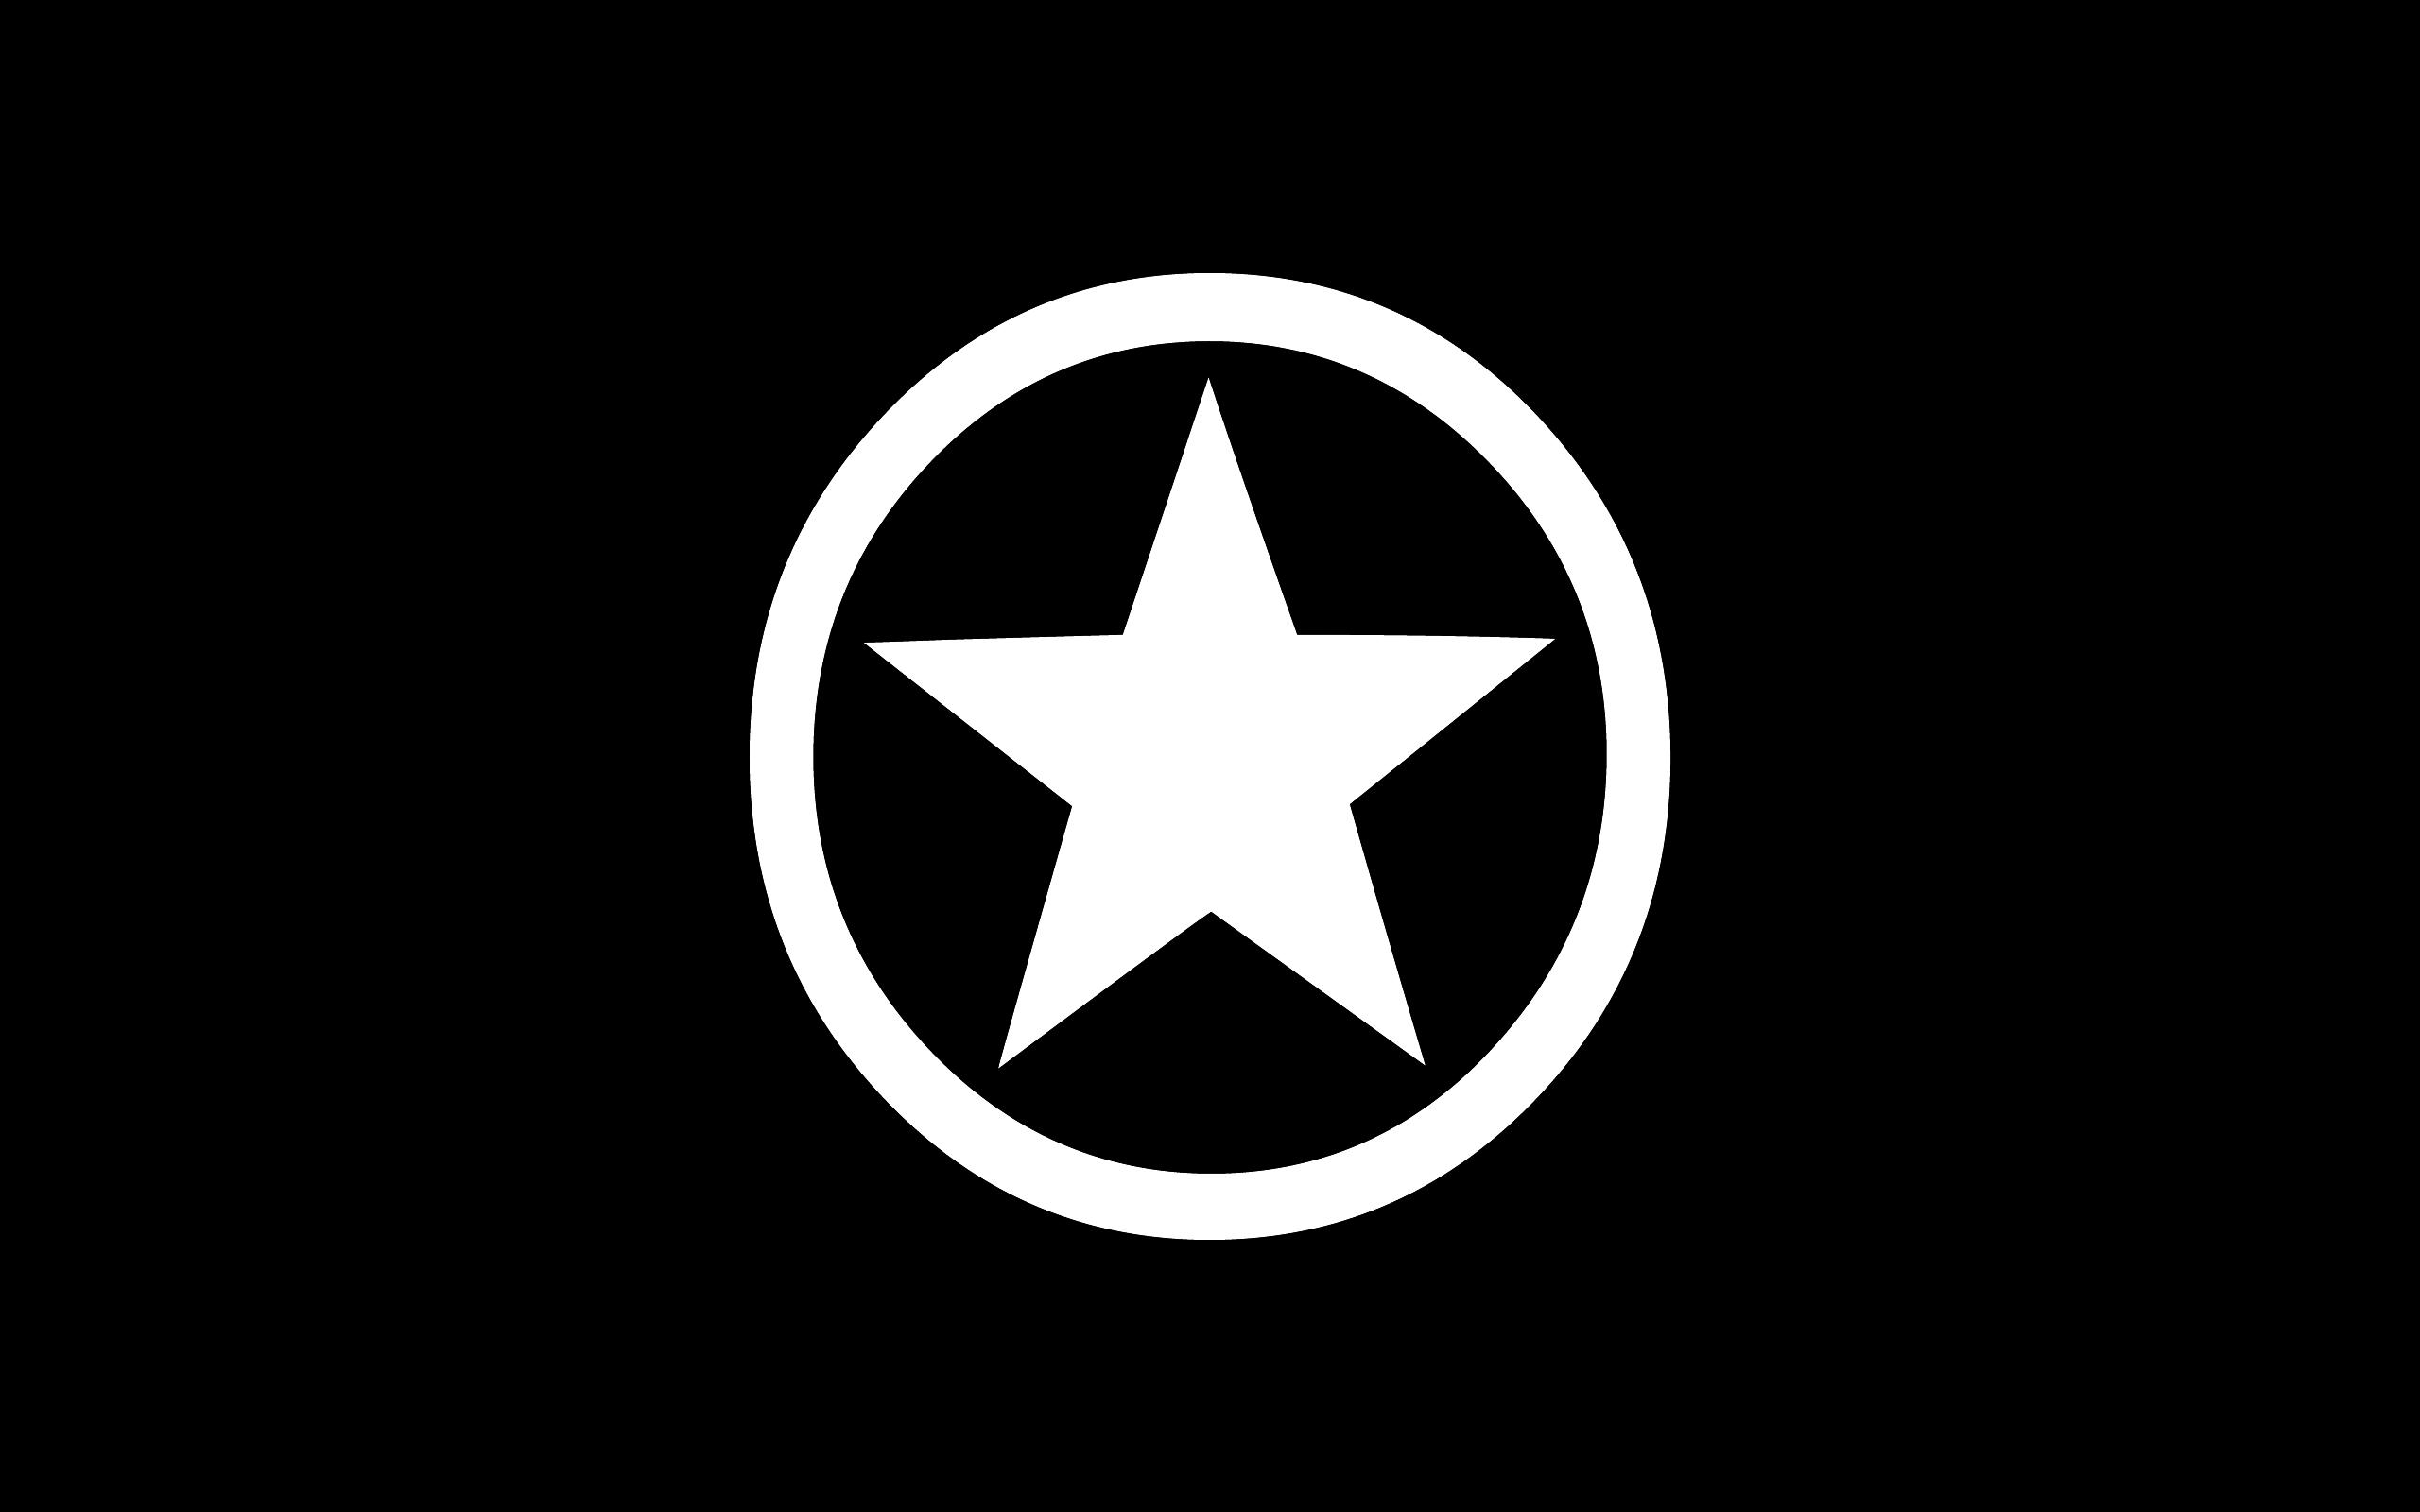 converse all star logo. converse logo 17060 all star o